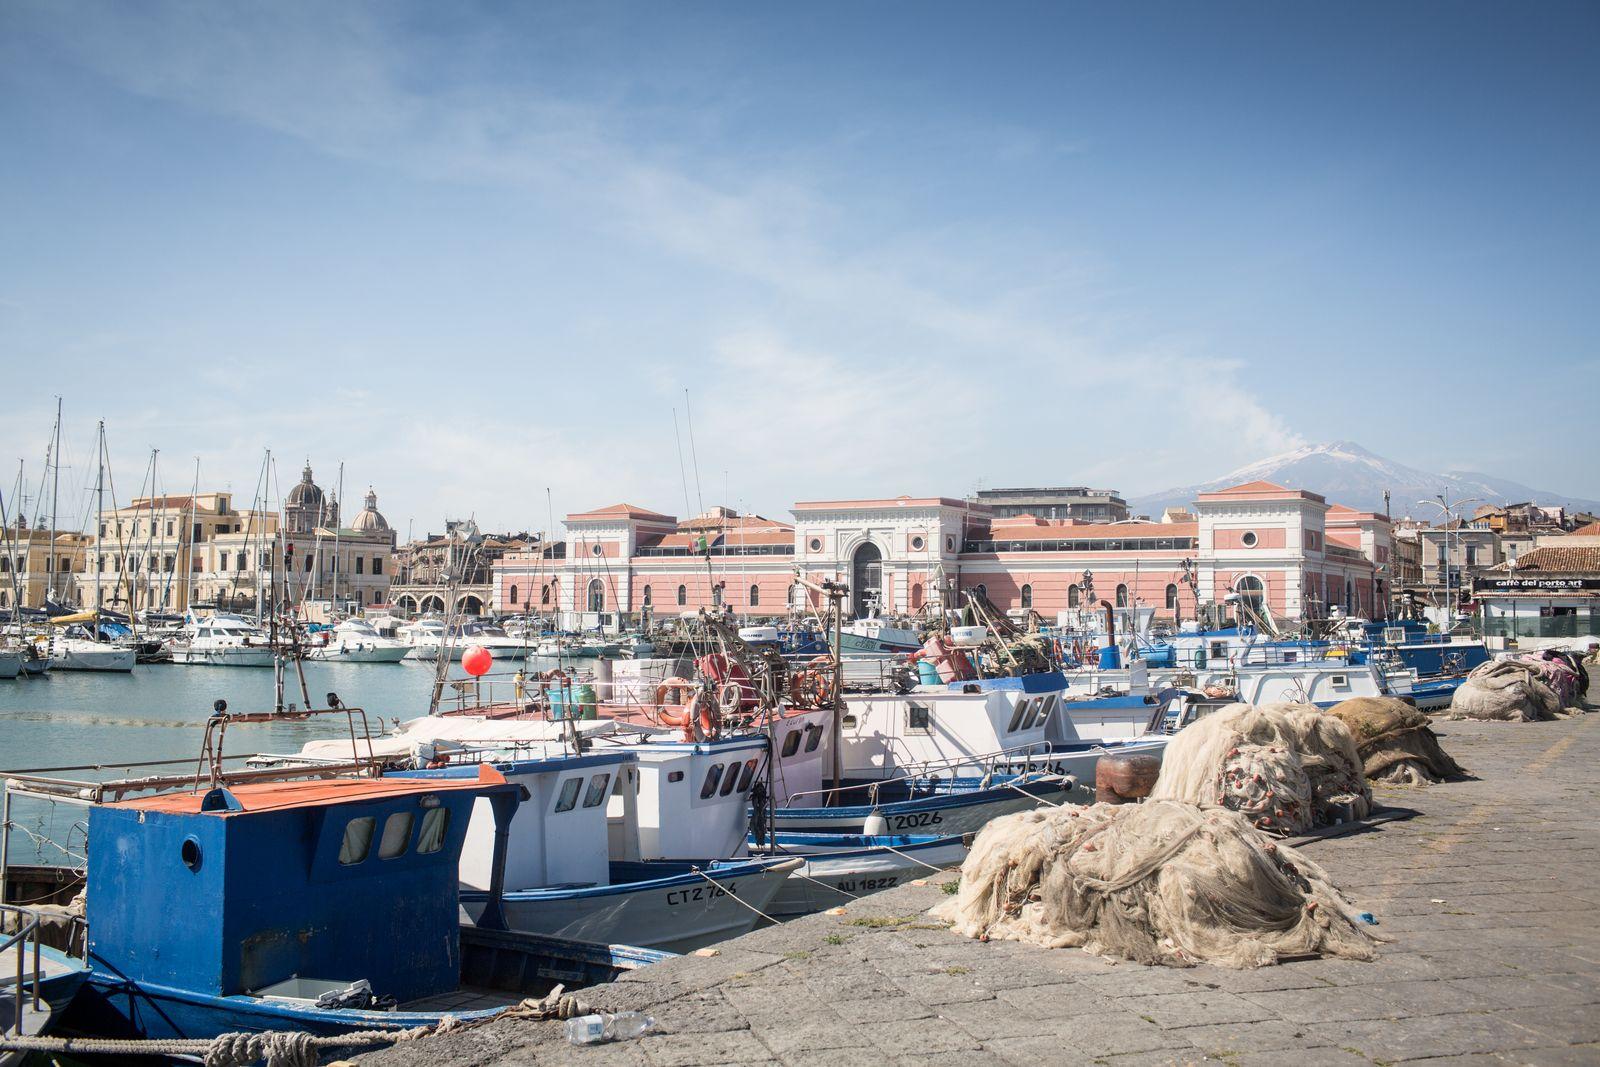 New Arrivals/ Scafista - Schleuser Sizilien